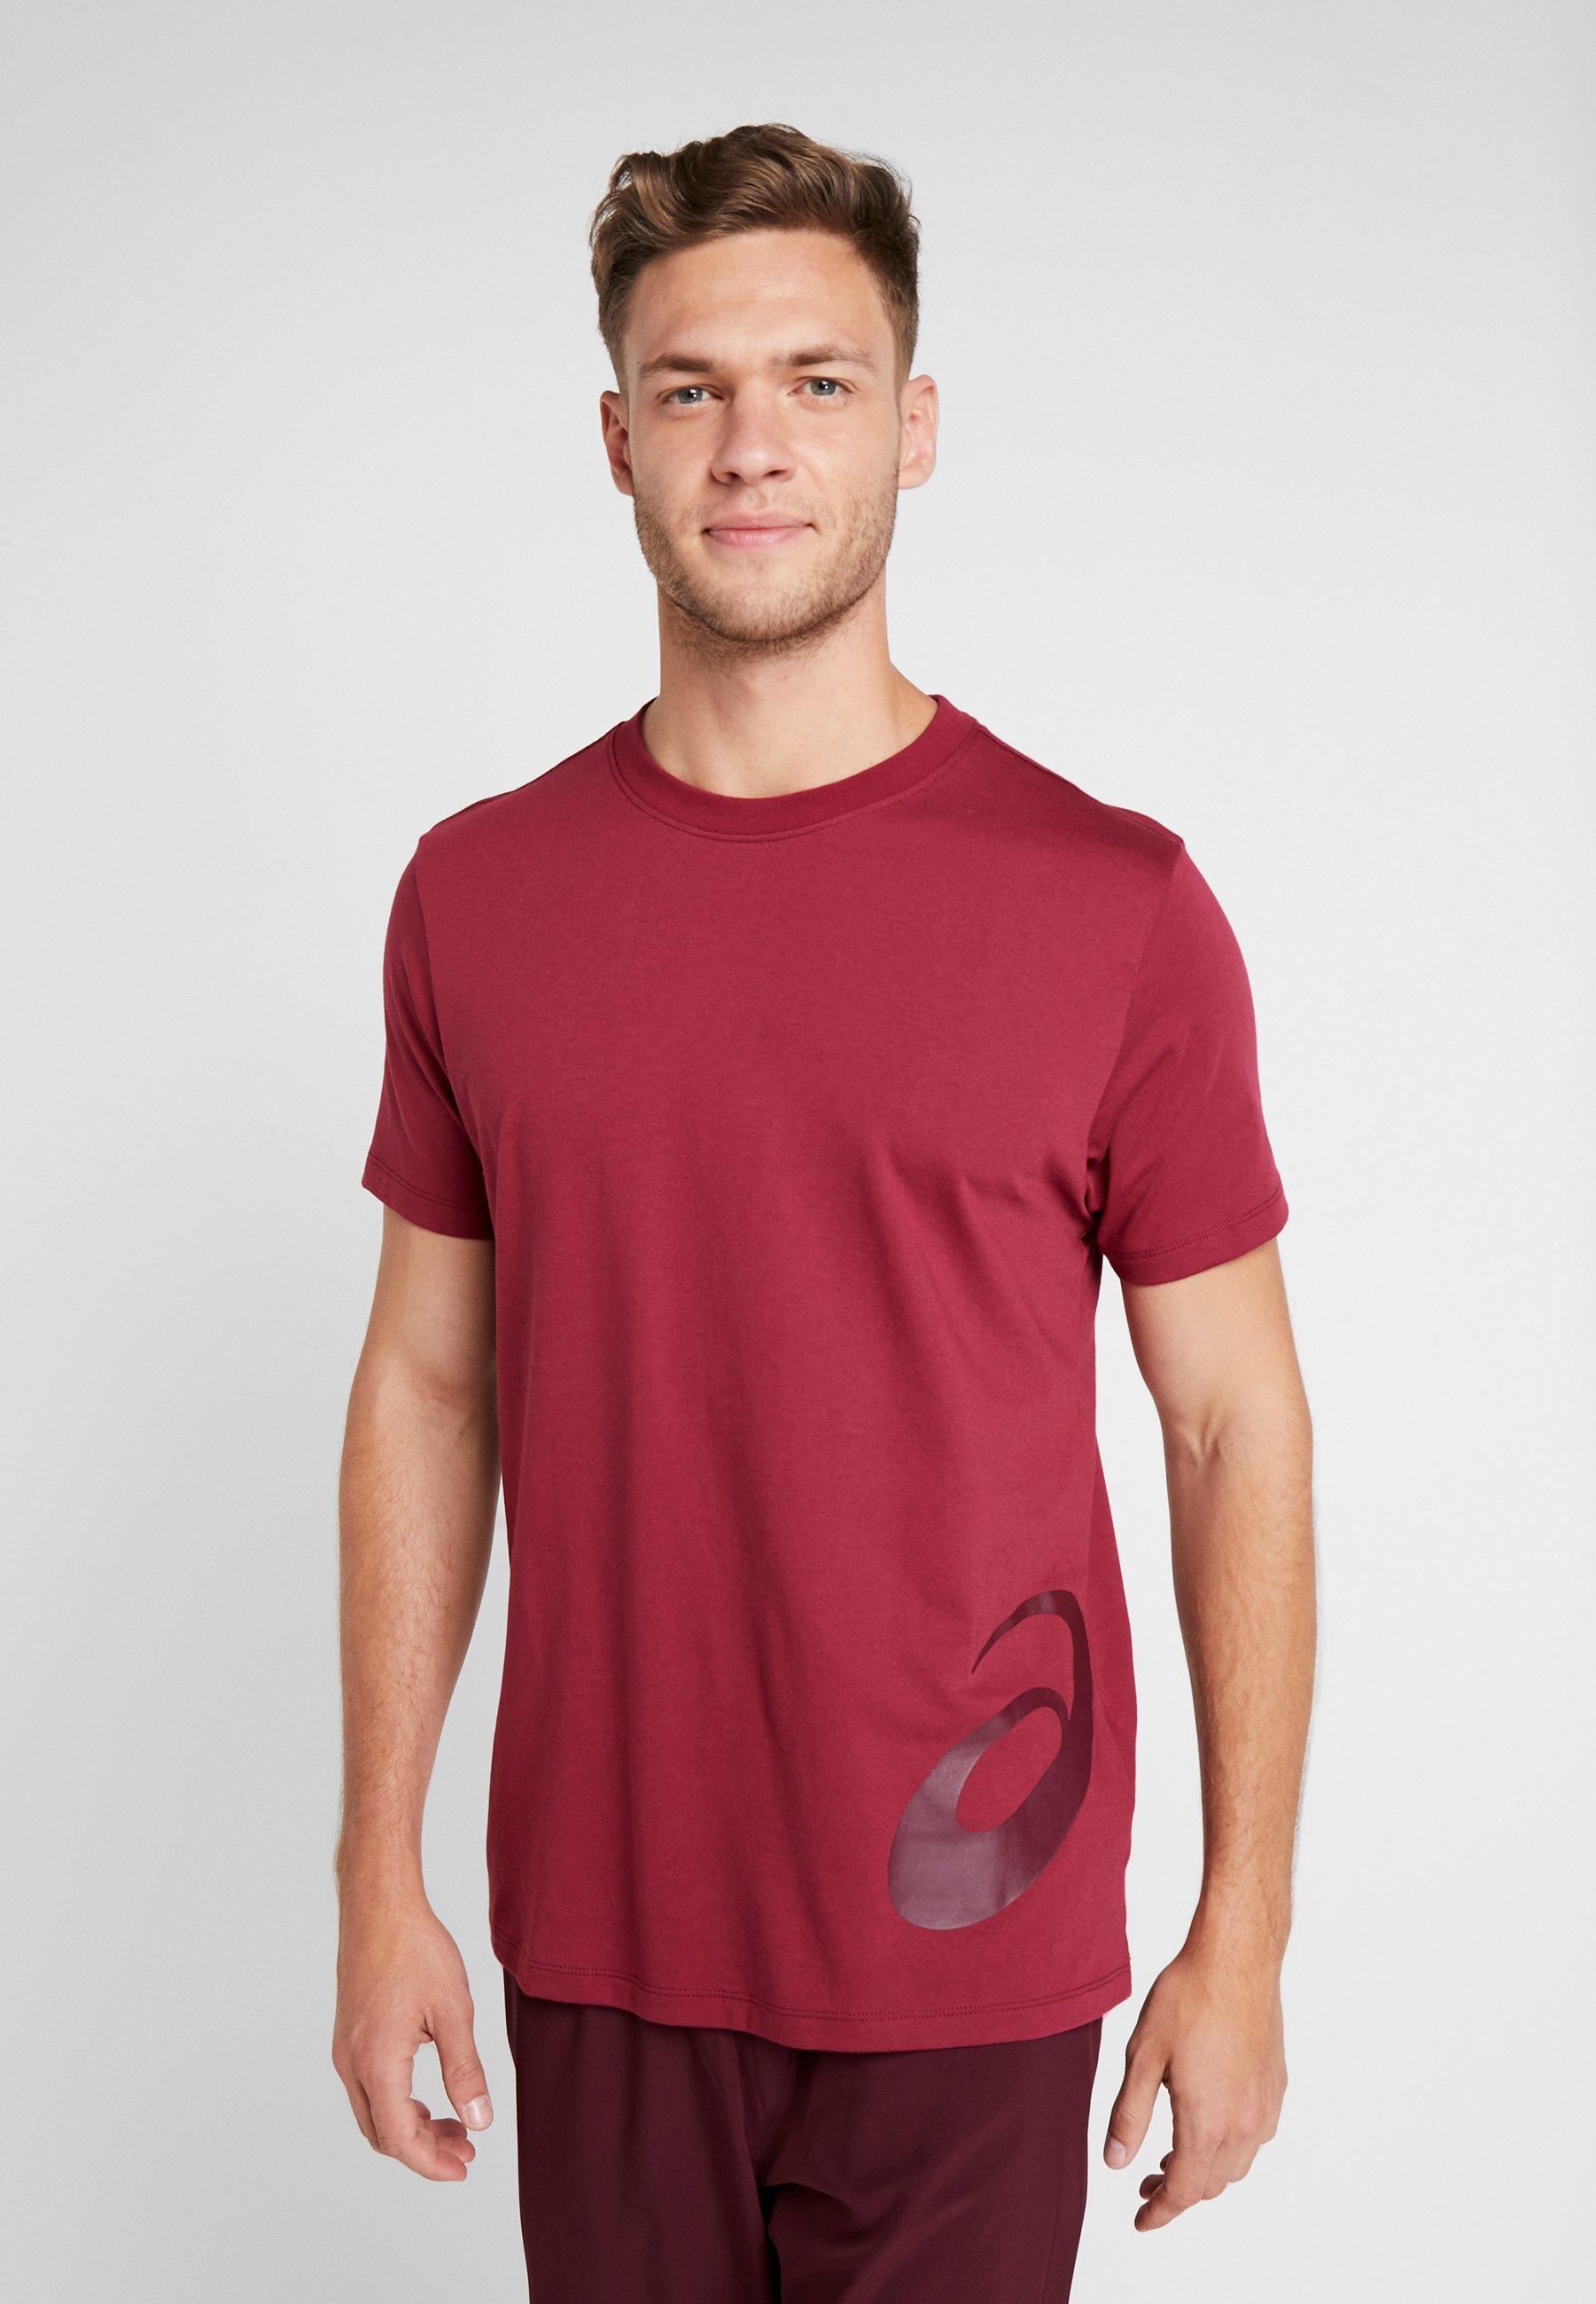 Chili Low TeeT shirt Imprimé Logo Flake Big deep Asics Mars nm0N8w